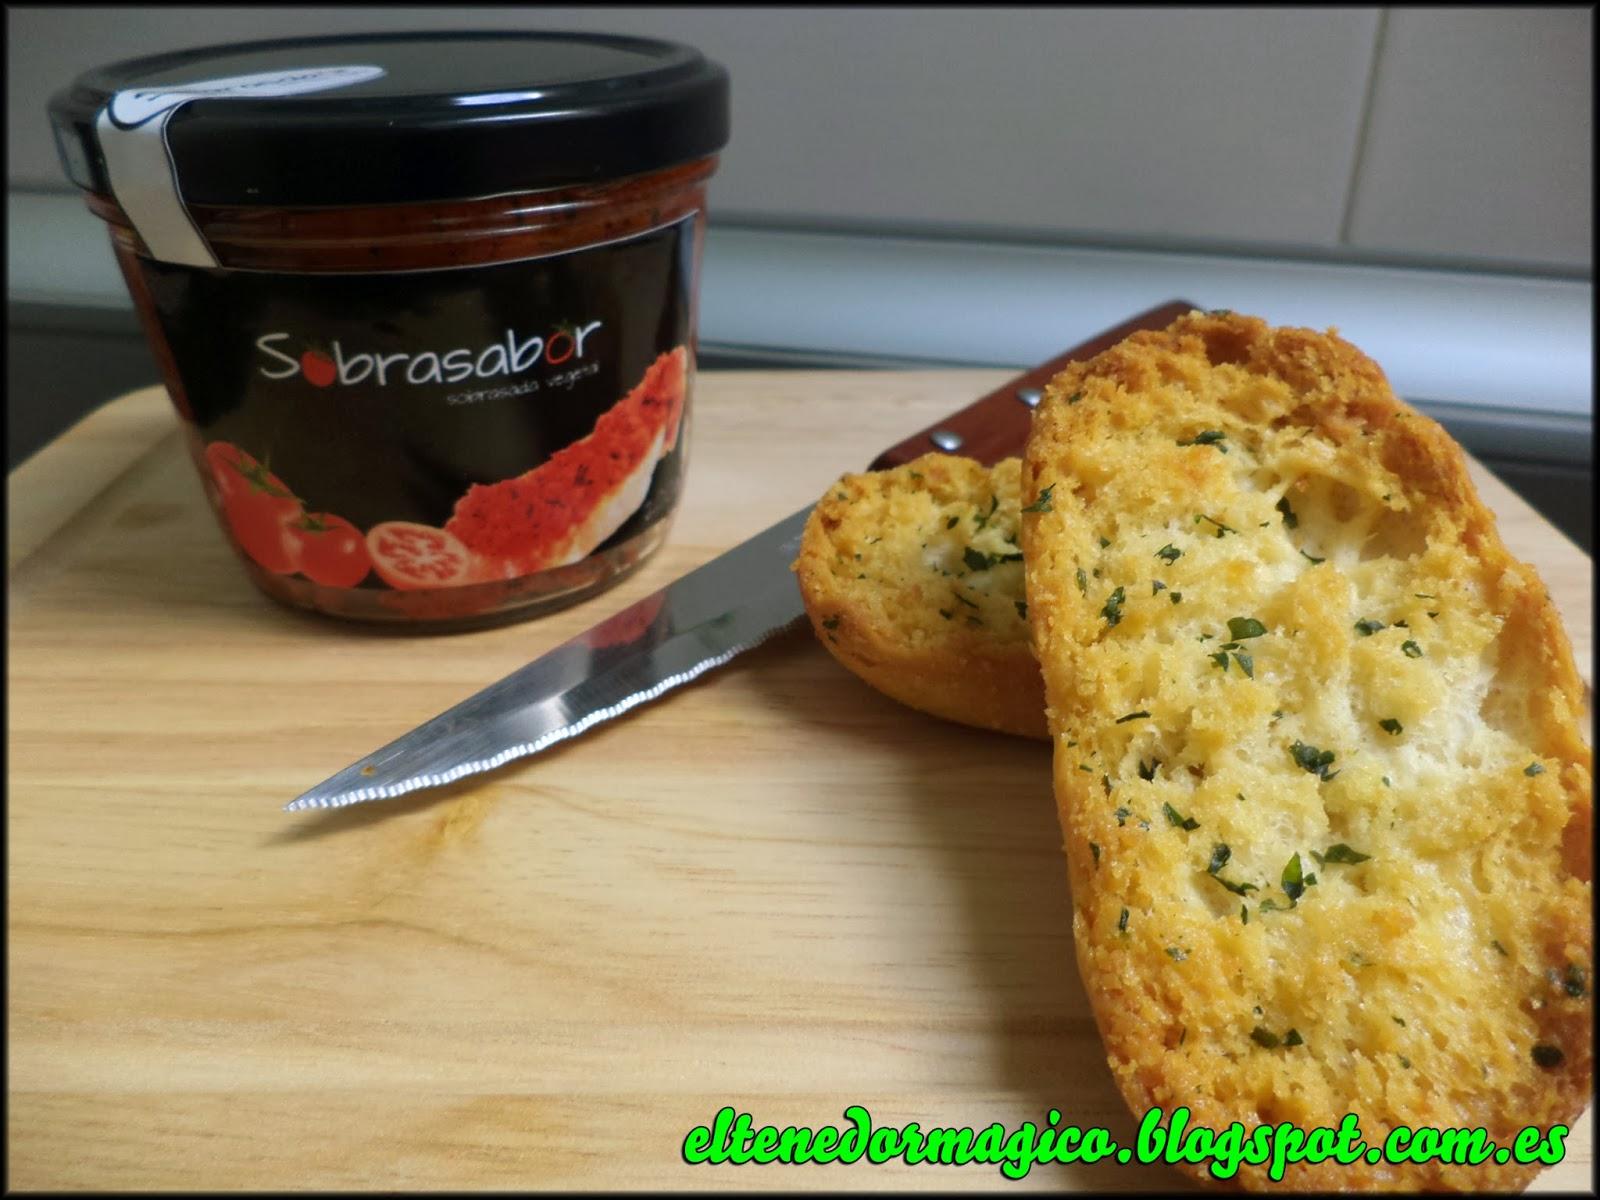 Producto de la semana: Sobrasada vegetal